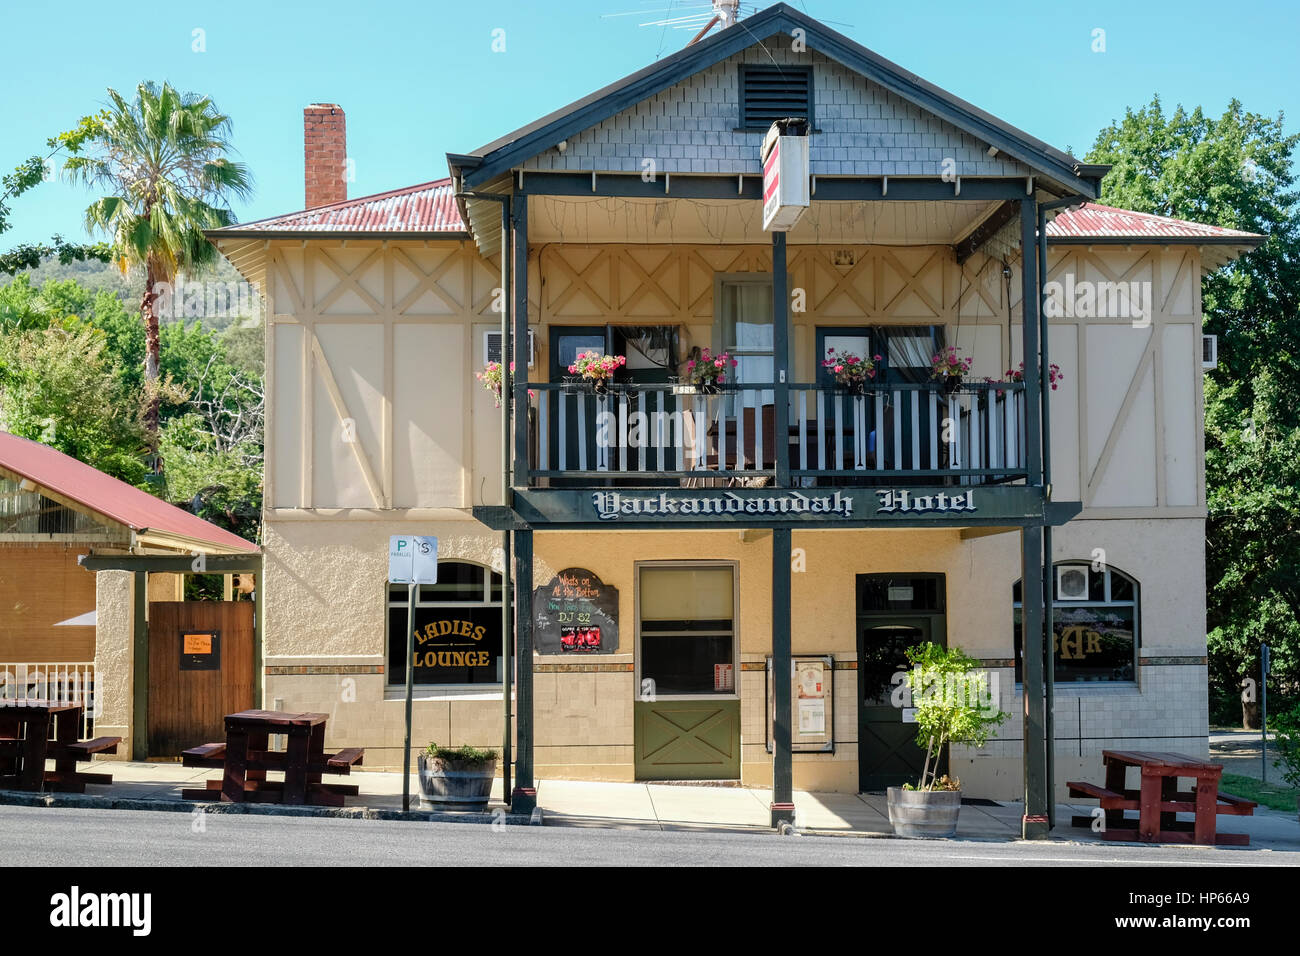 Yackandandah Hotel, Main Street of historic town of Yackandandah, Victoria, Australia - Stock Image